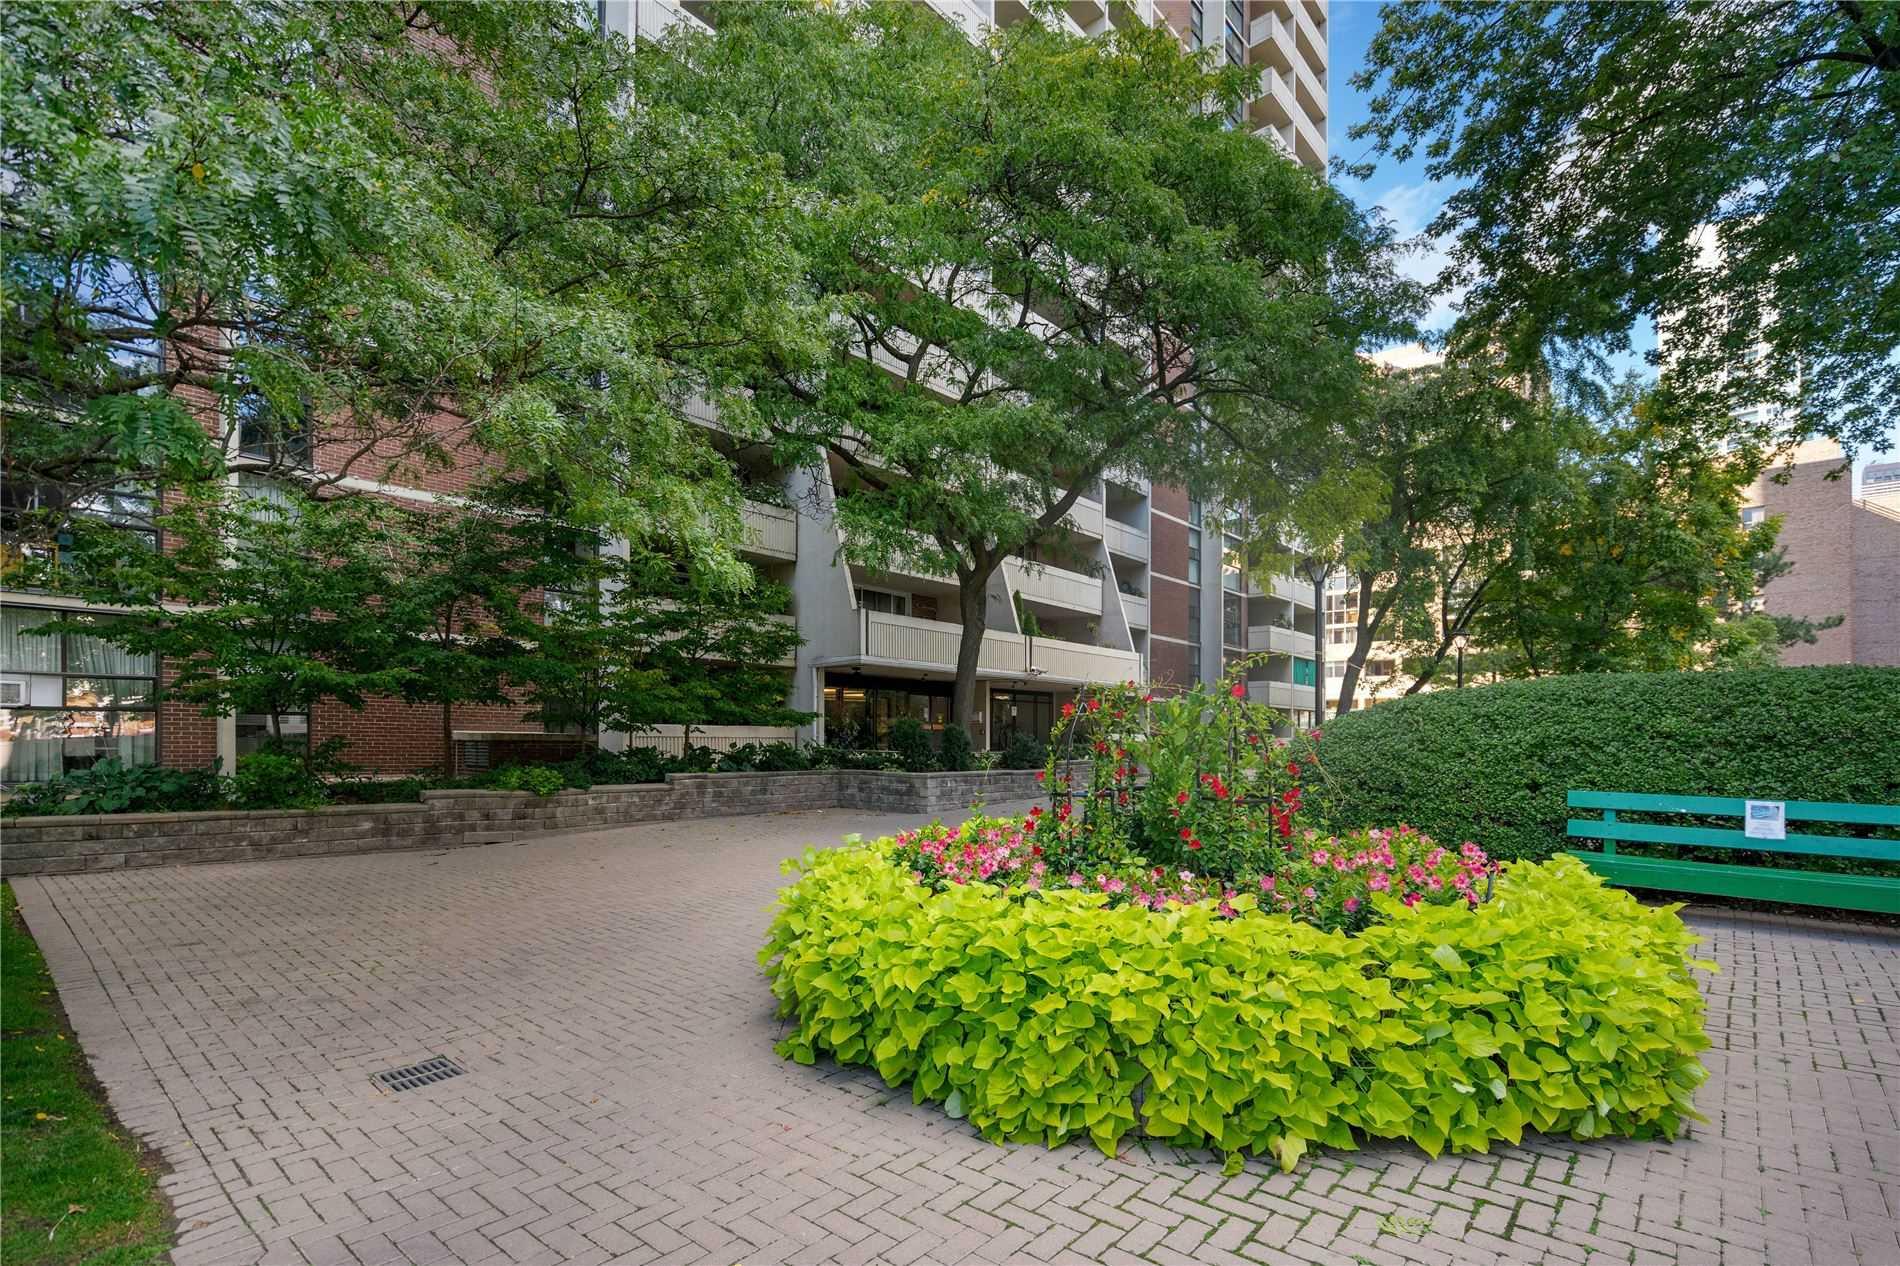 #803 - 40 Homewood Ave, Toronto